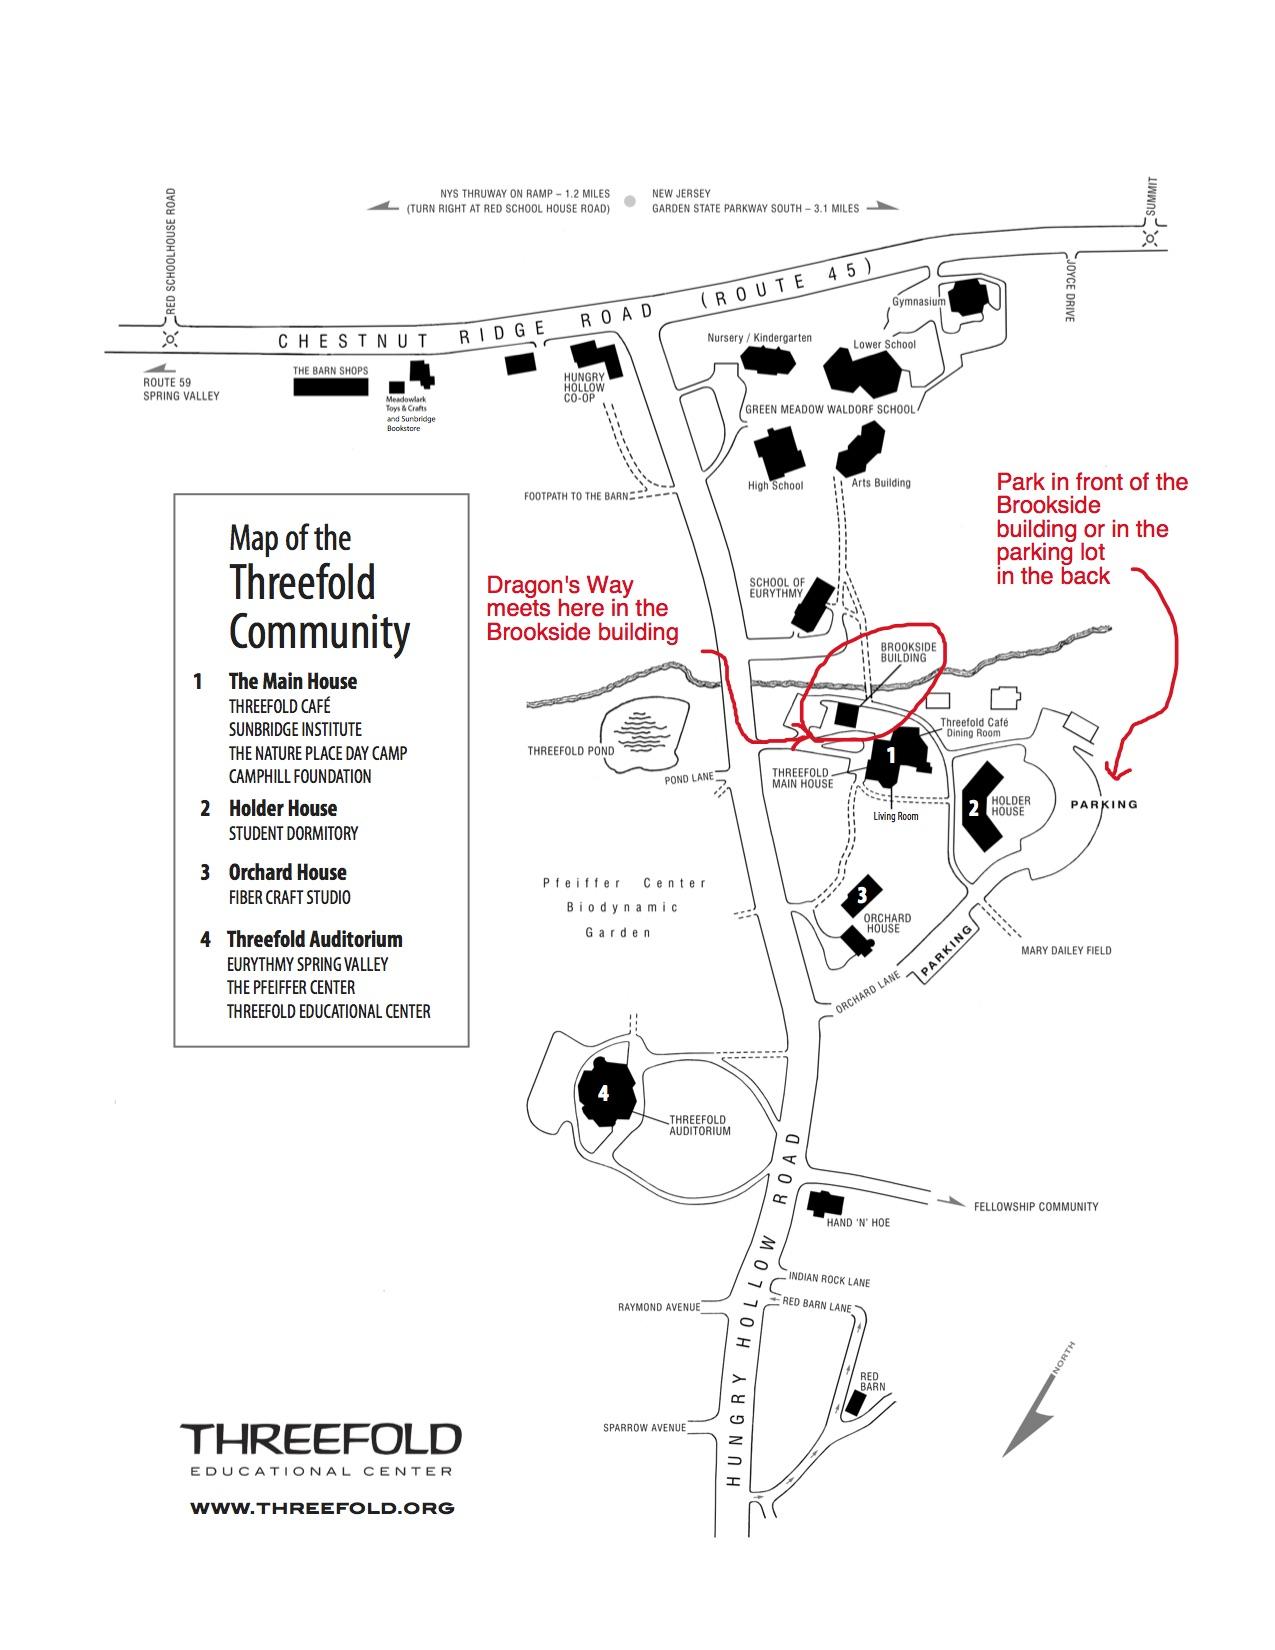 Threefold_Community_Map.jpg